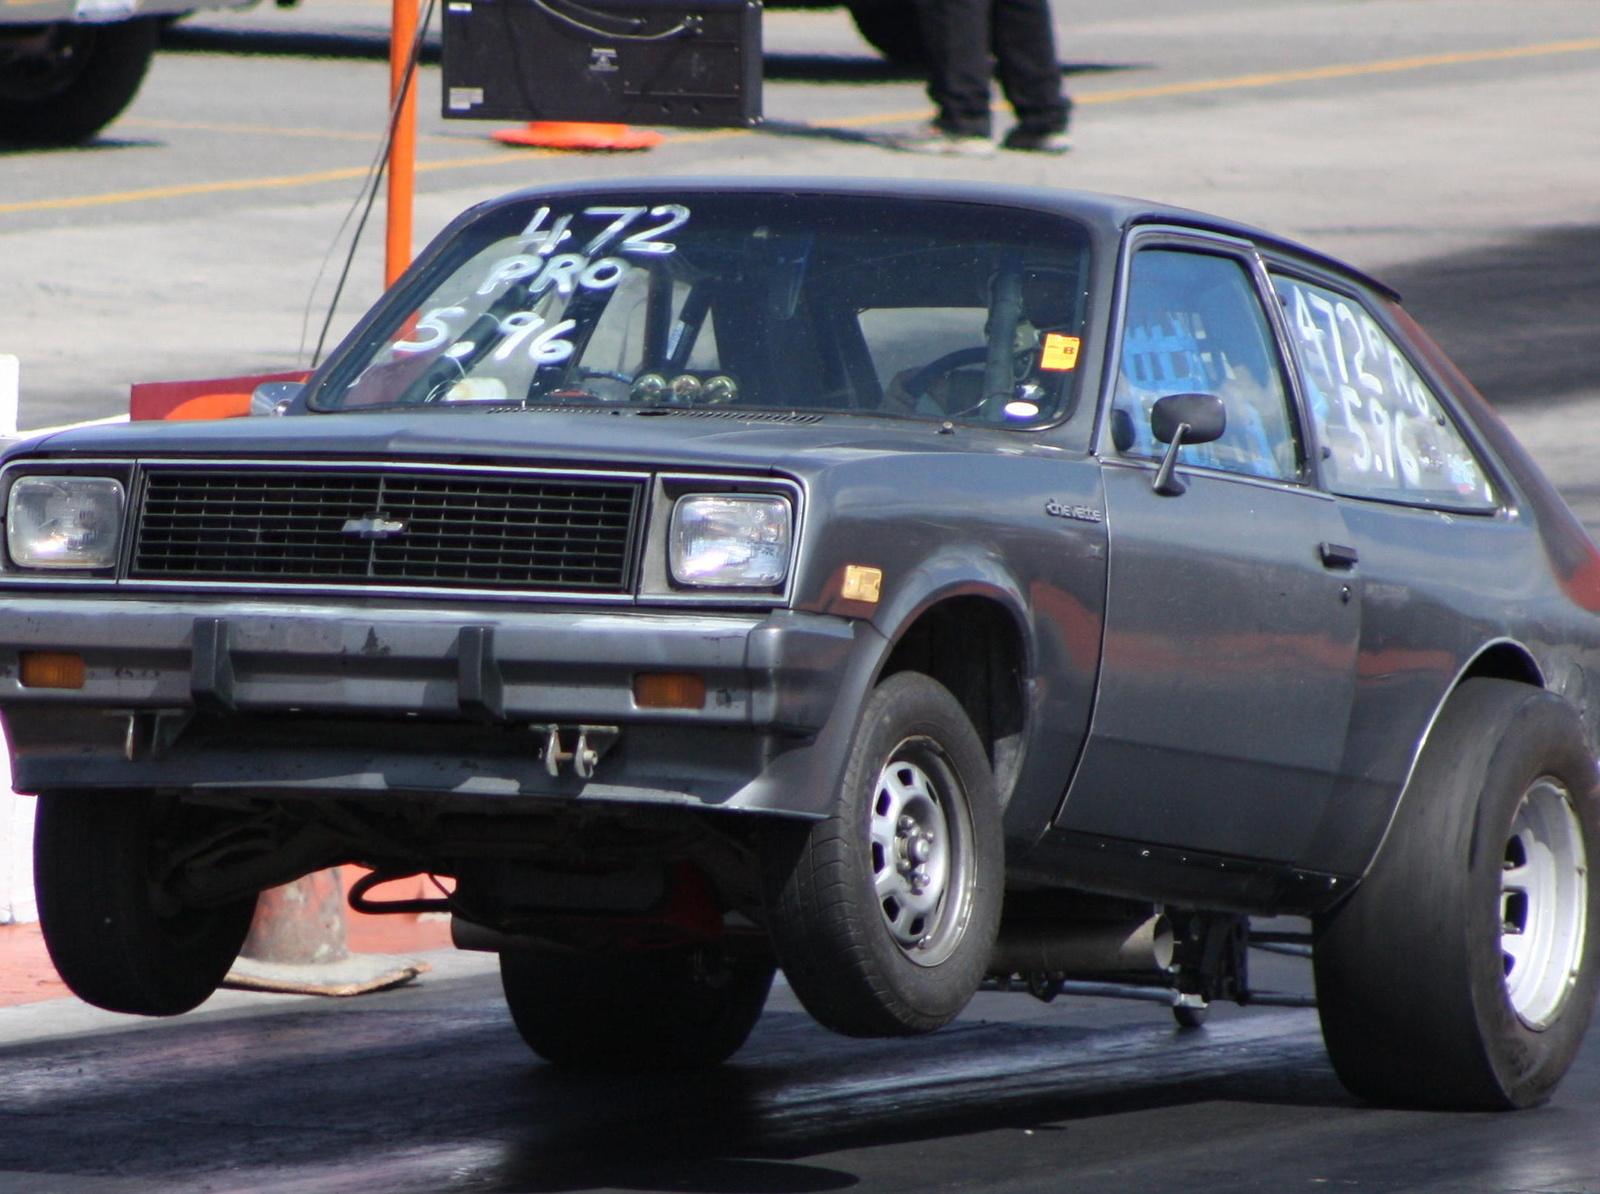 1986 Chevrolet Chevette - Overview - CarGurus